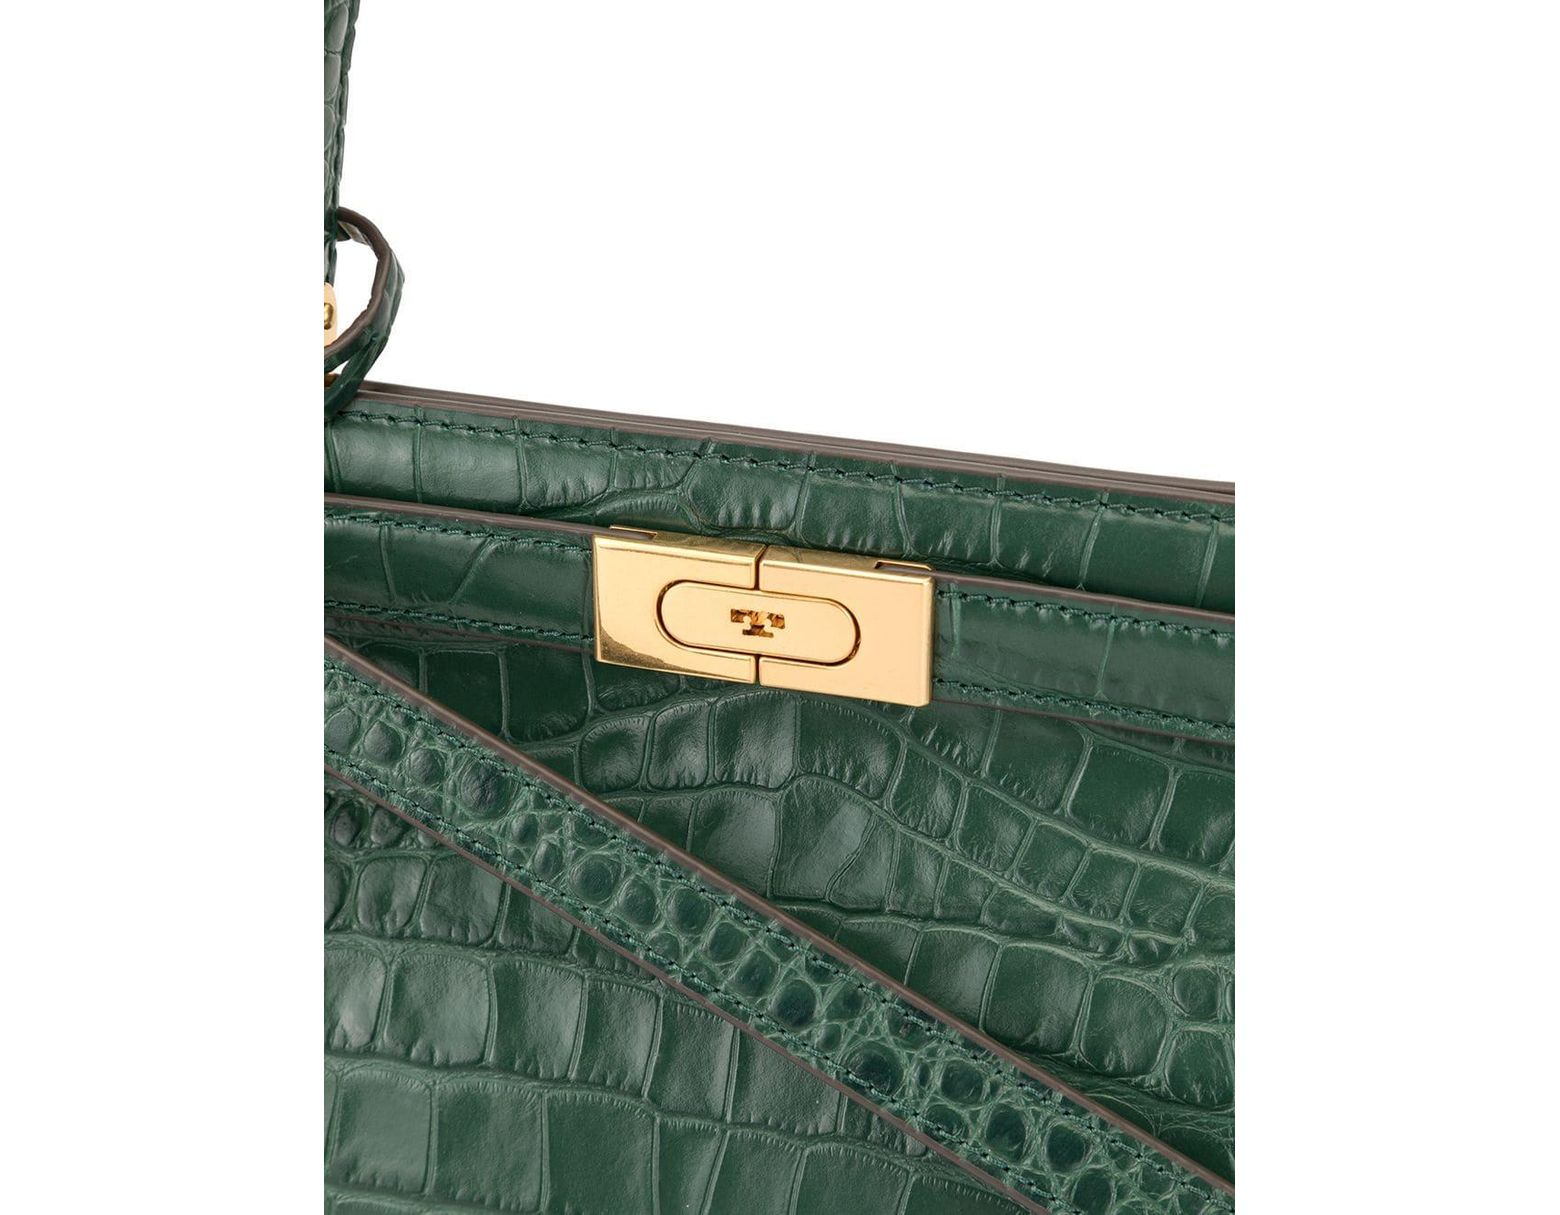 810cf95973 Tory Burch Croc Embossed Handbag in Green - Save 24% - Lyst